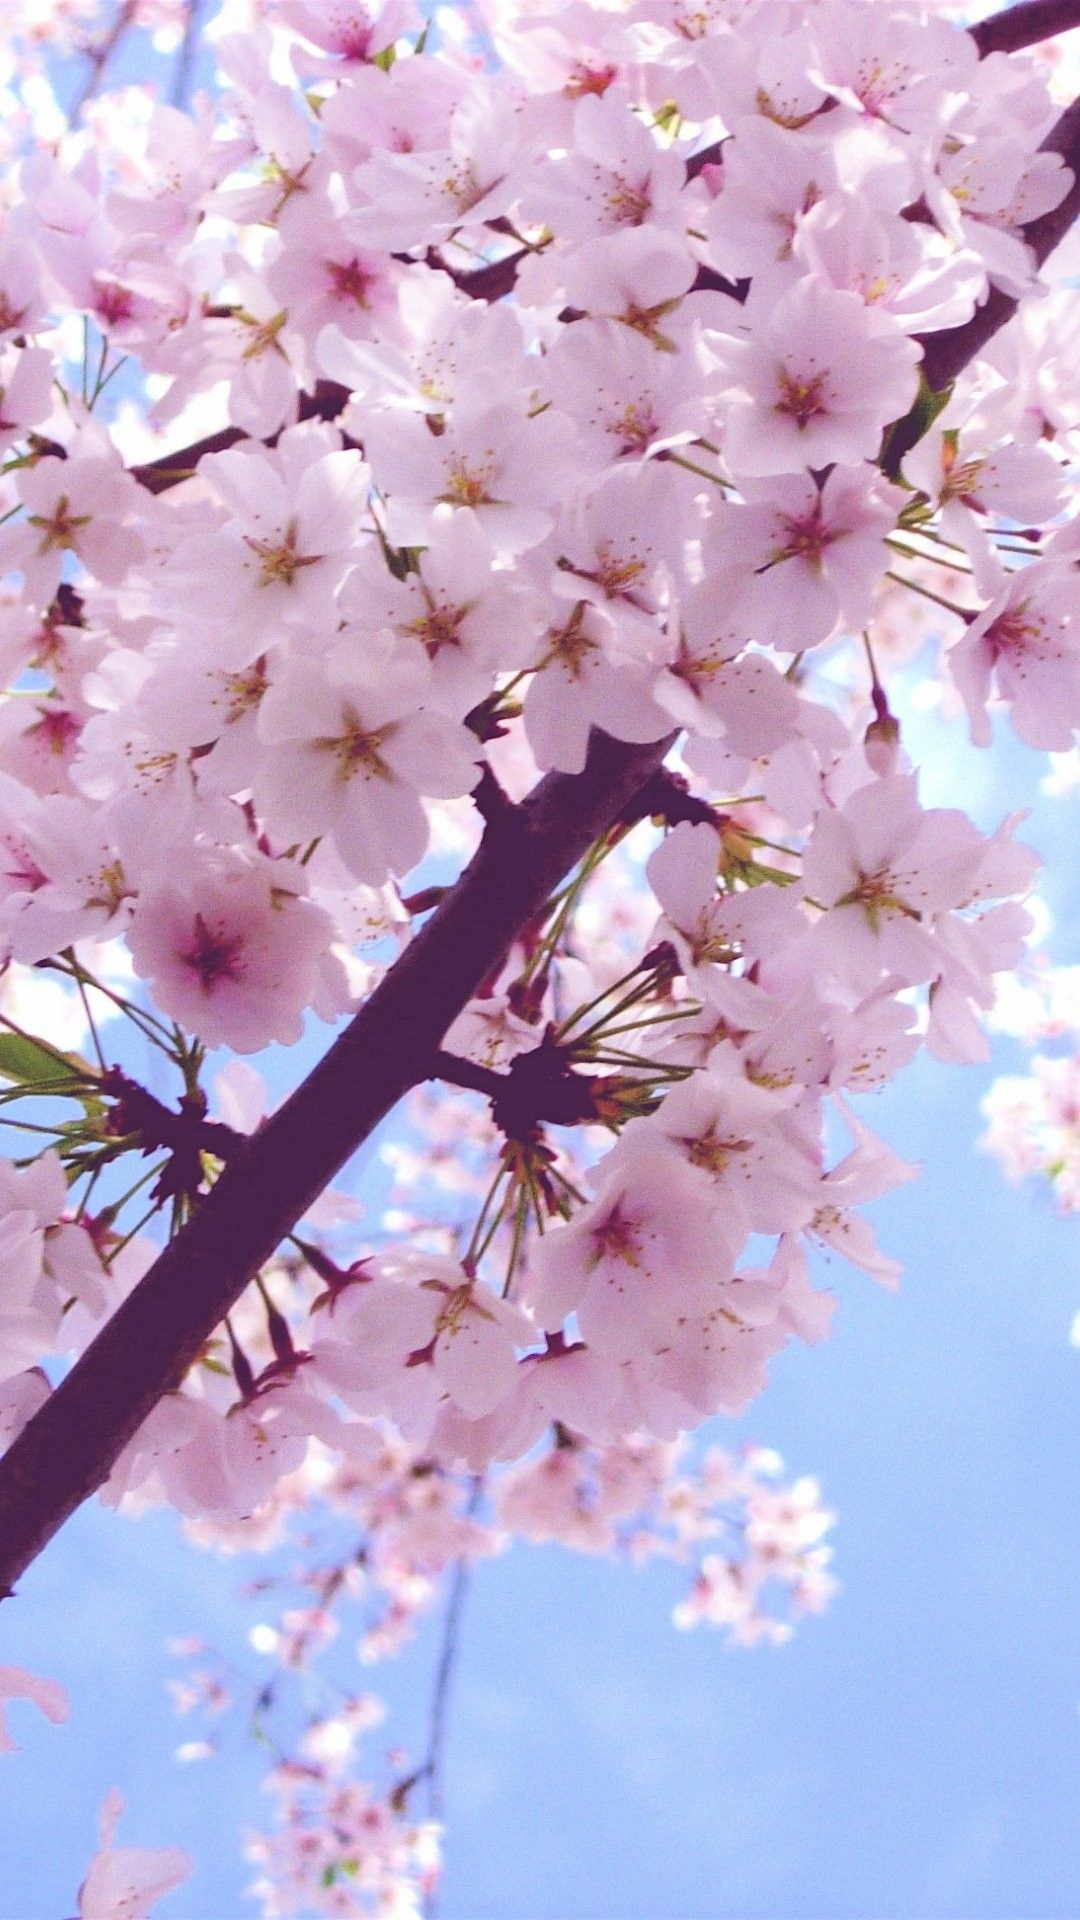 Cherry blossom iphone 6 plus wallpaper 6556 flowers iphone 6 plus wallpapers